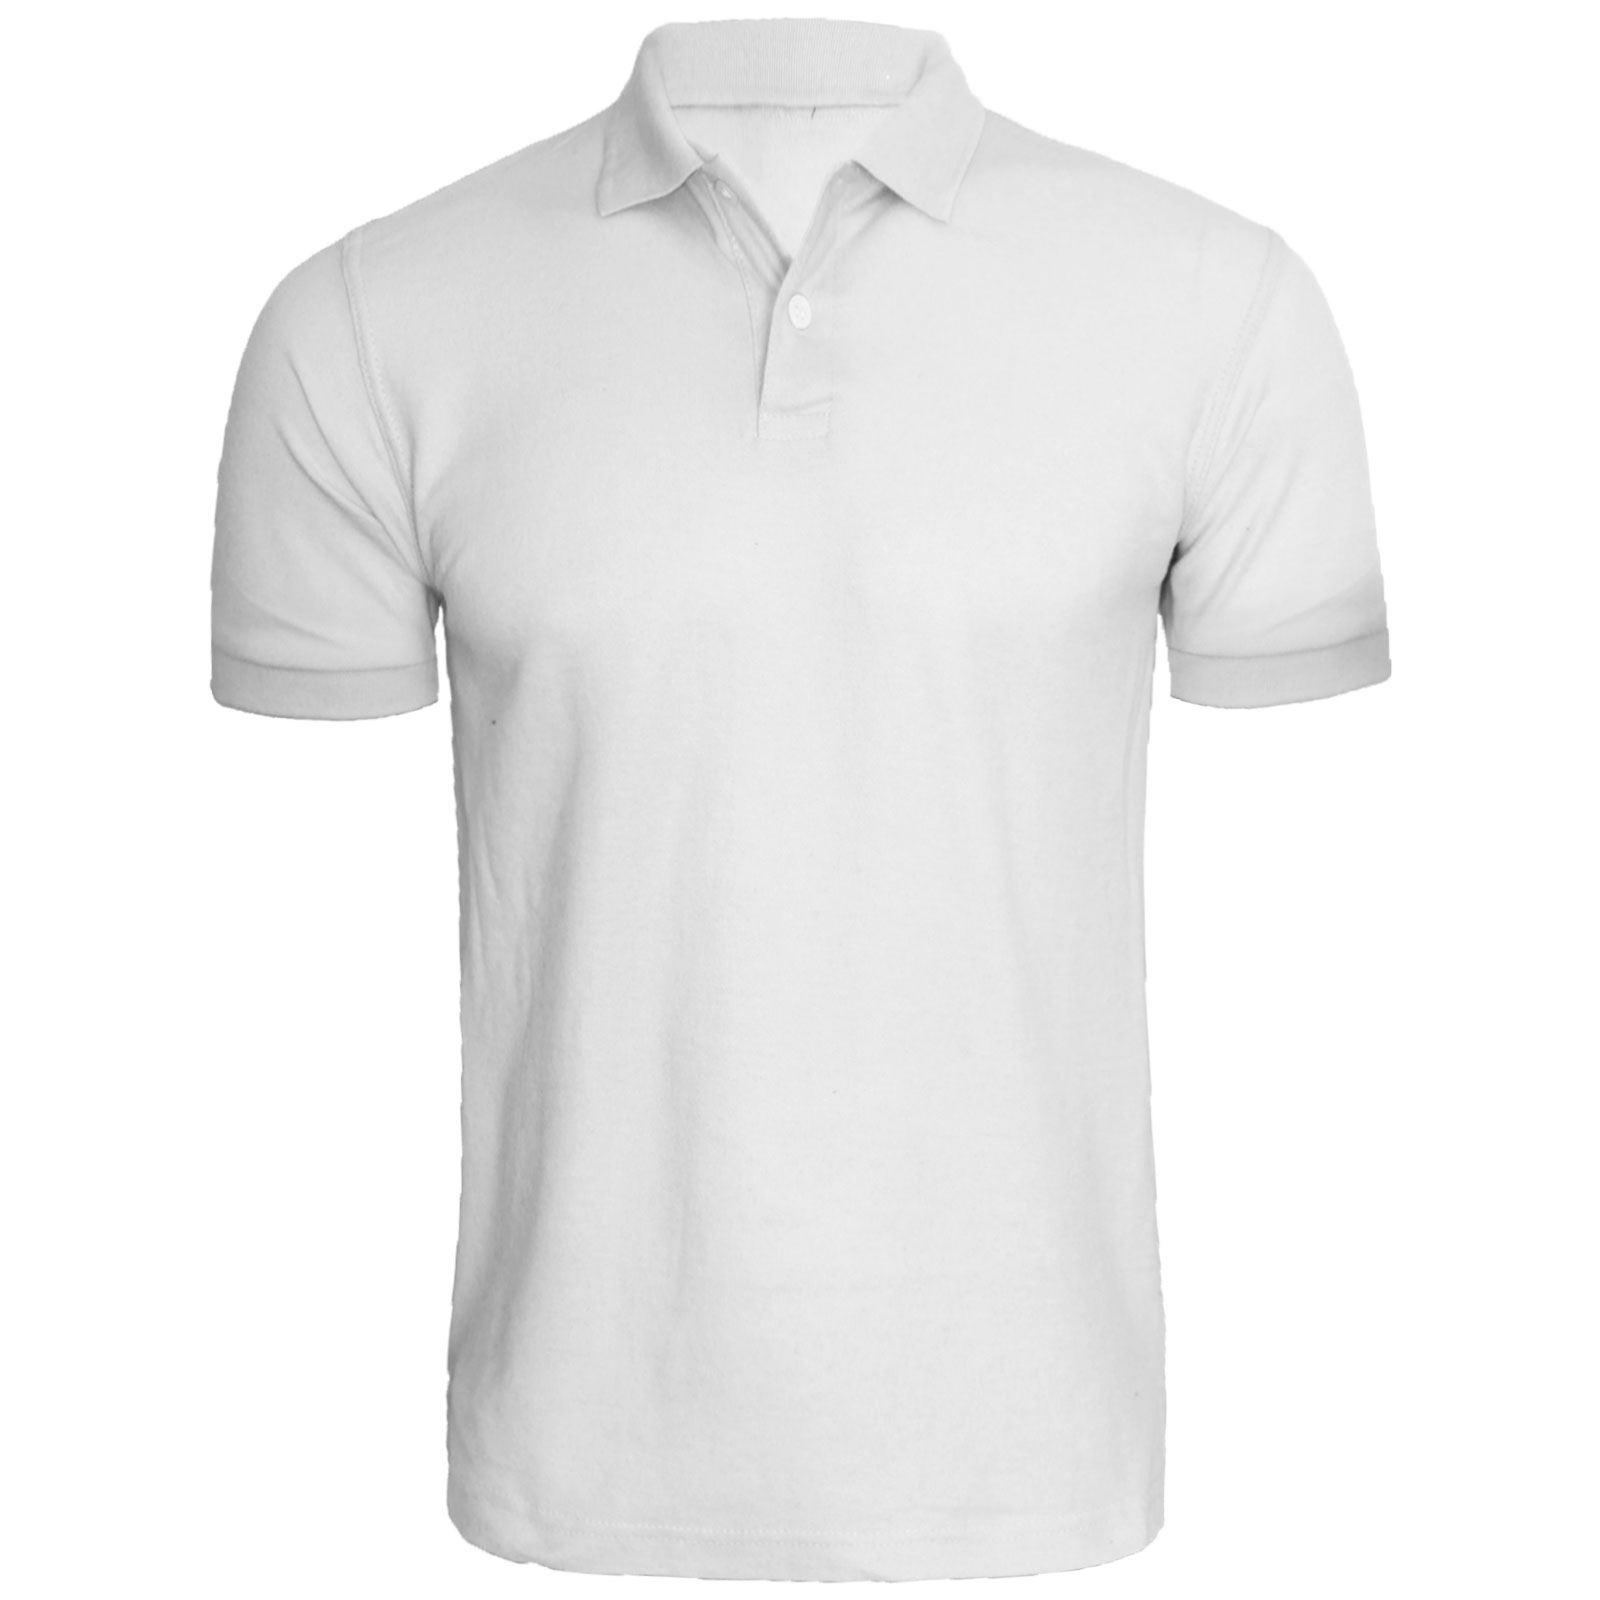 Men 39 S Polo Shirt Plain T Shirt Stripe Short Sleeve Shirt